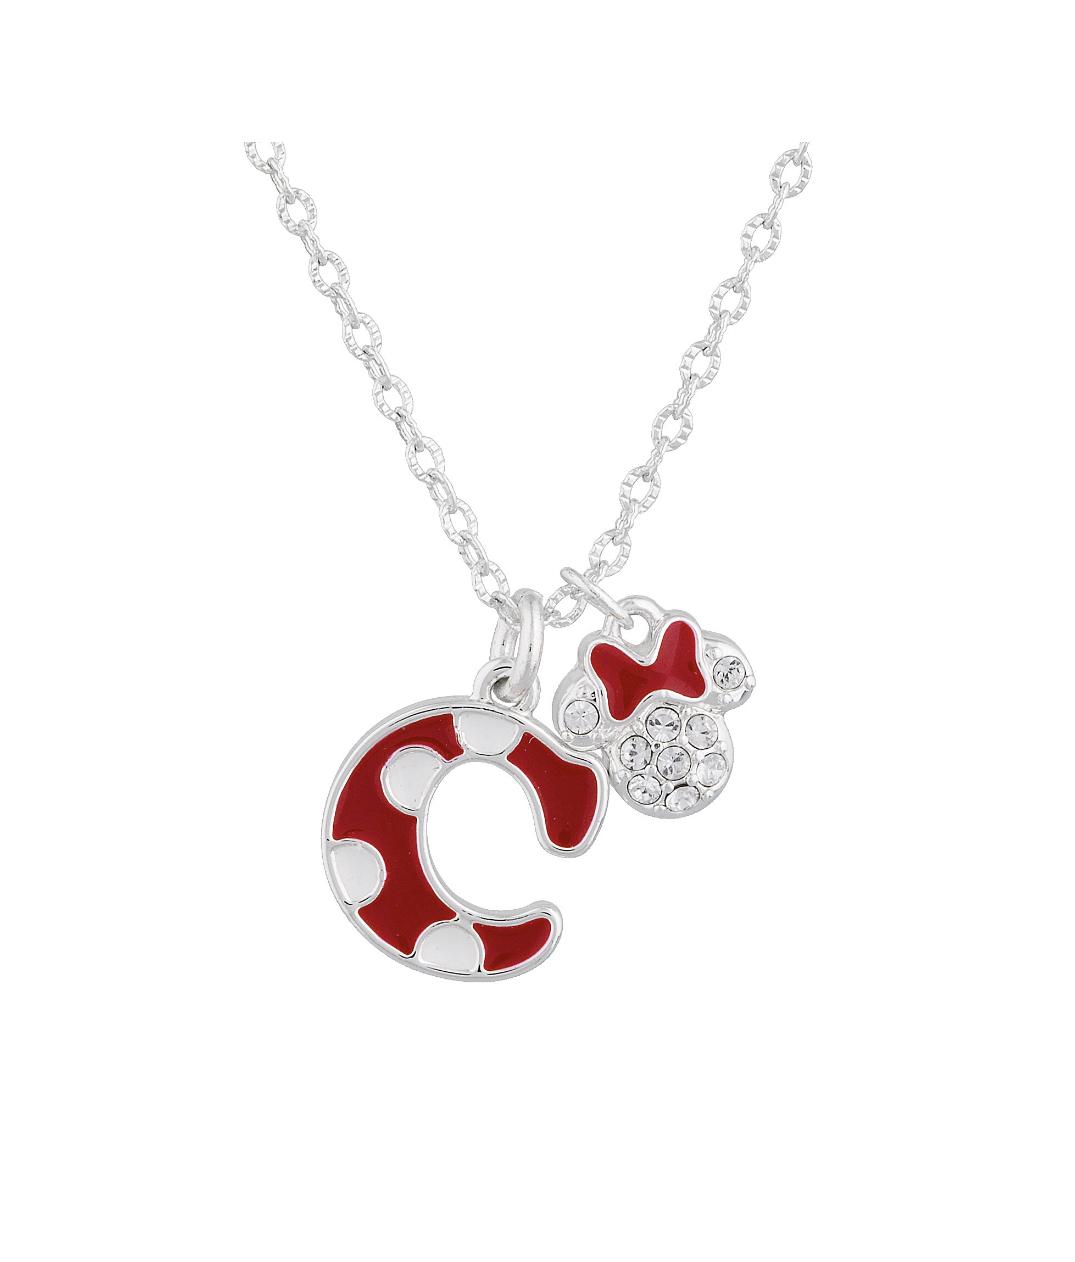 Disney Parks Minnie Polka Dot Initial C Letter Necklace Swarovski Crystal Charm Within 2020 Disney Minnie's Polka Dots Pendant Necklaces (View 4 of 25)